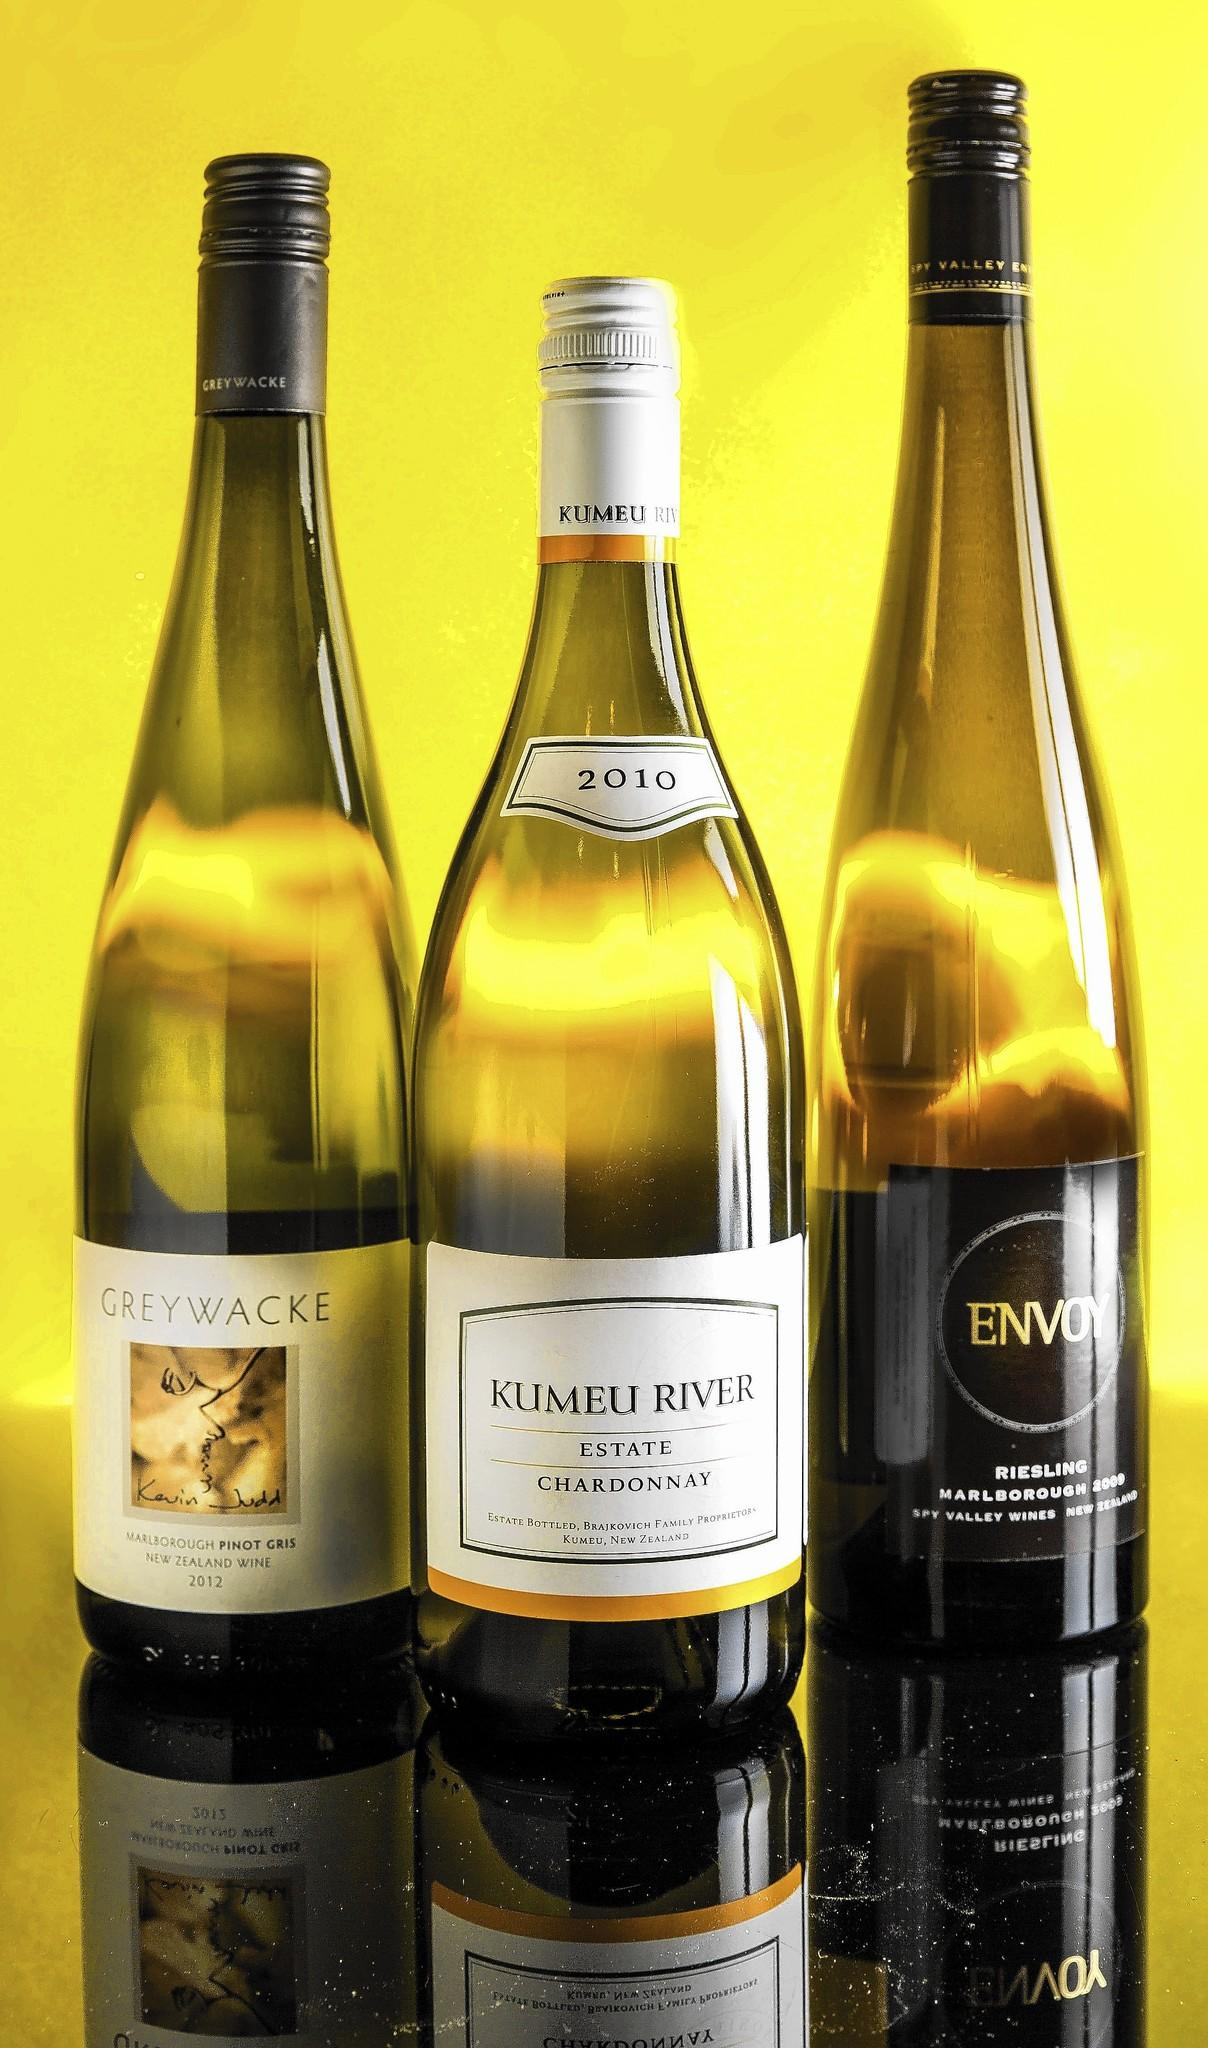 Envoy Riesling, Kumeu River Chardonnay, and Grey Wacke Pinot Gris.